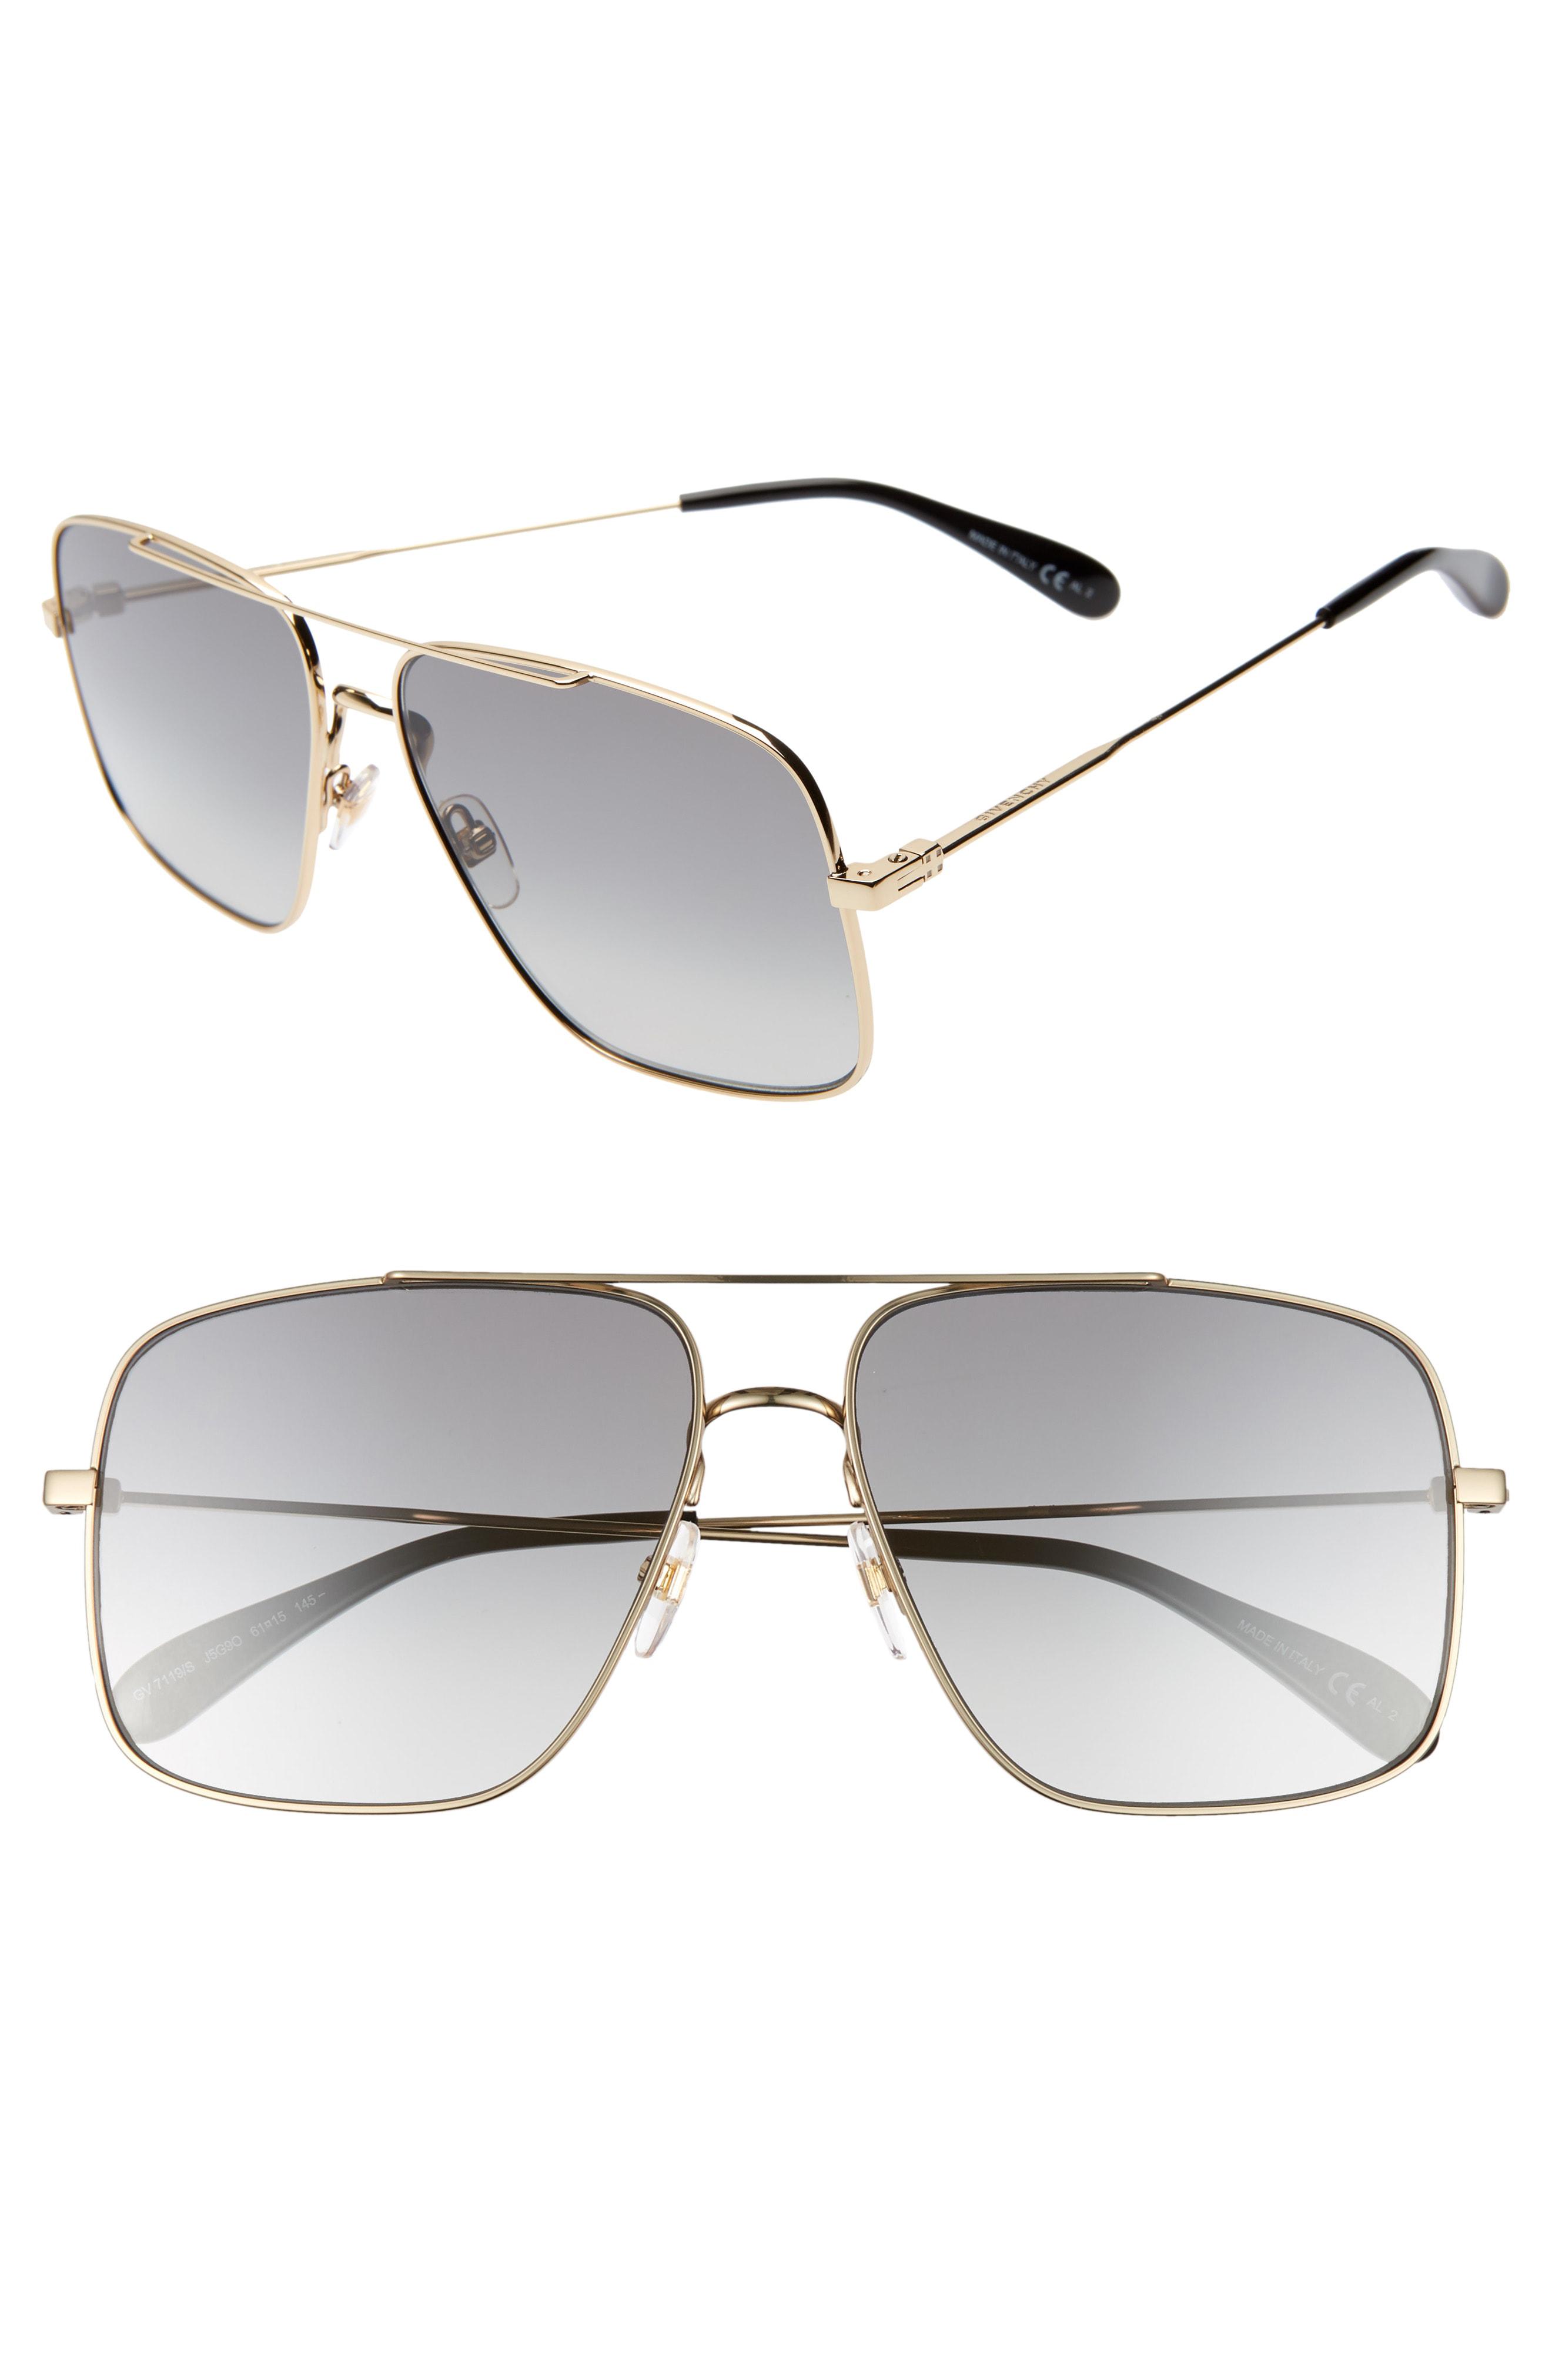 75d040e0a6139 Givenchy 61Mm Navigator Sunglasses - Gold  Grey